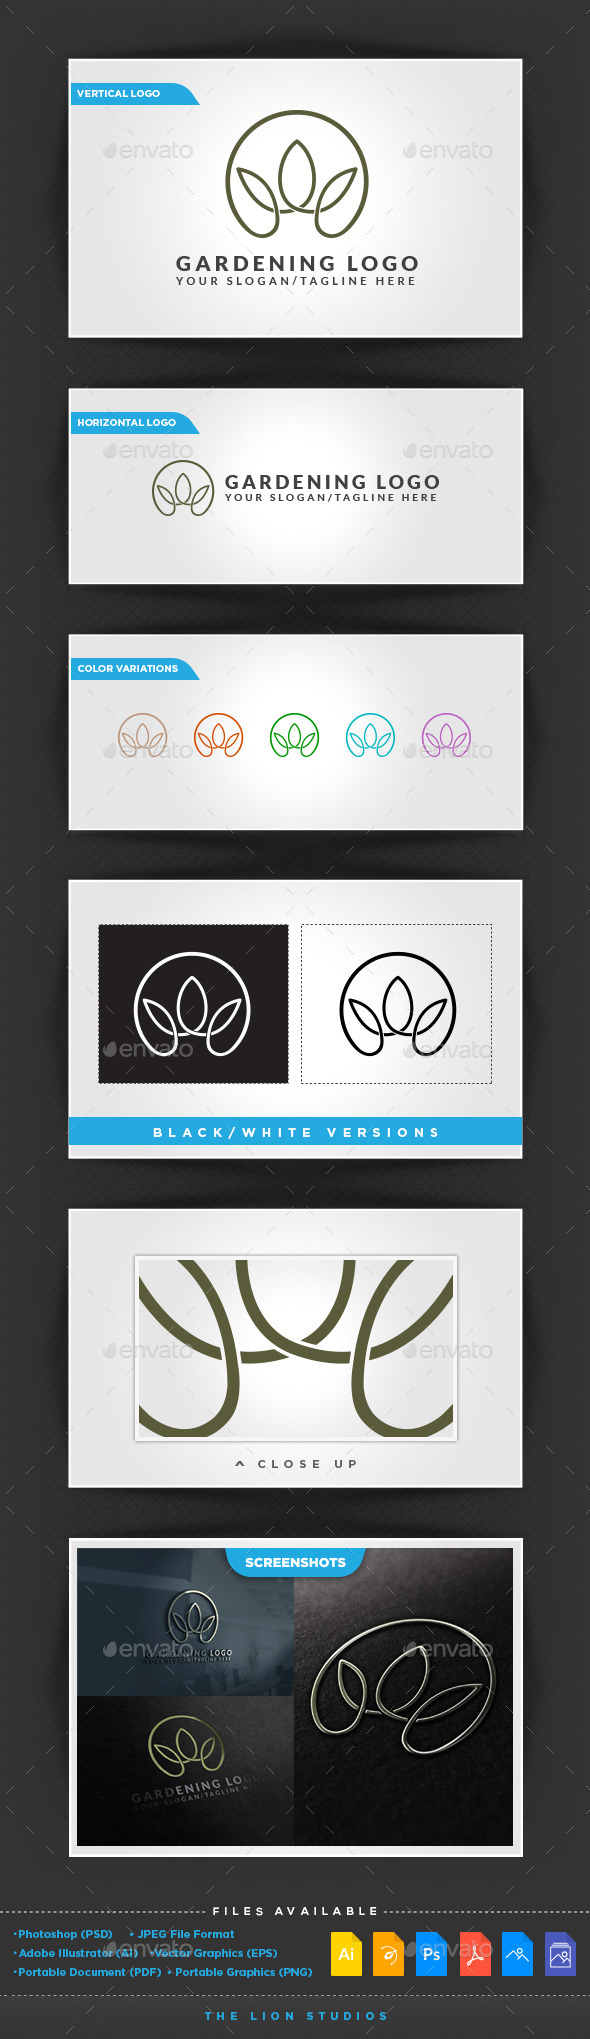 GraphicRiver Gardening Logo 10116219